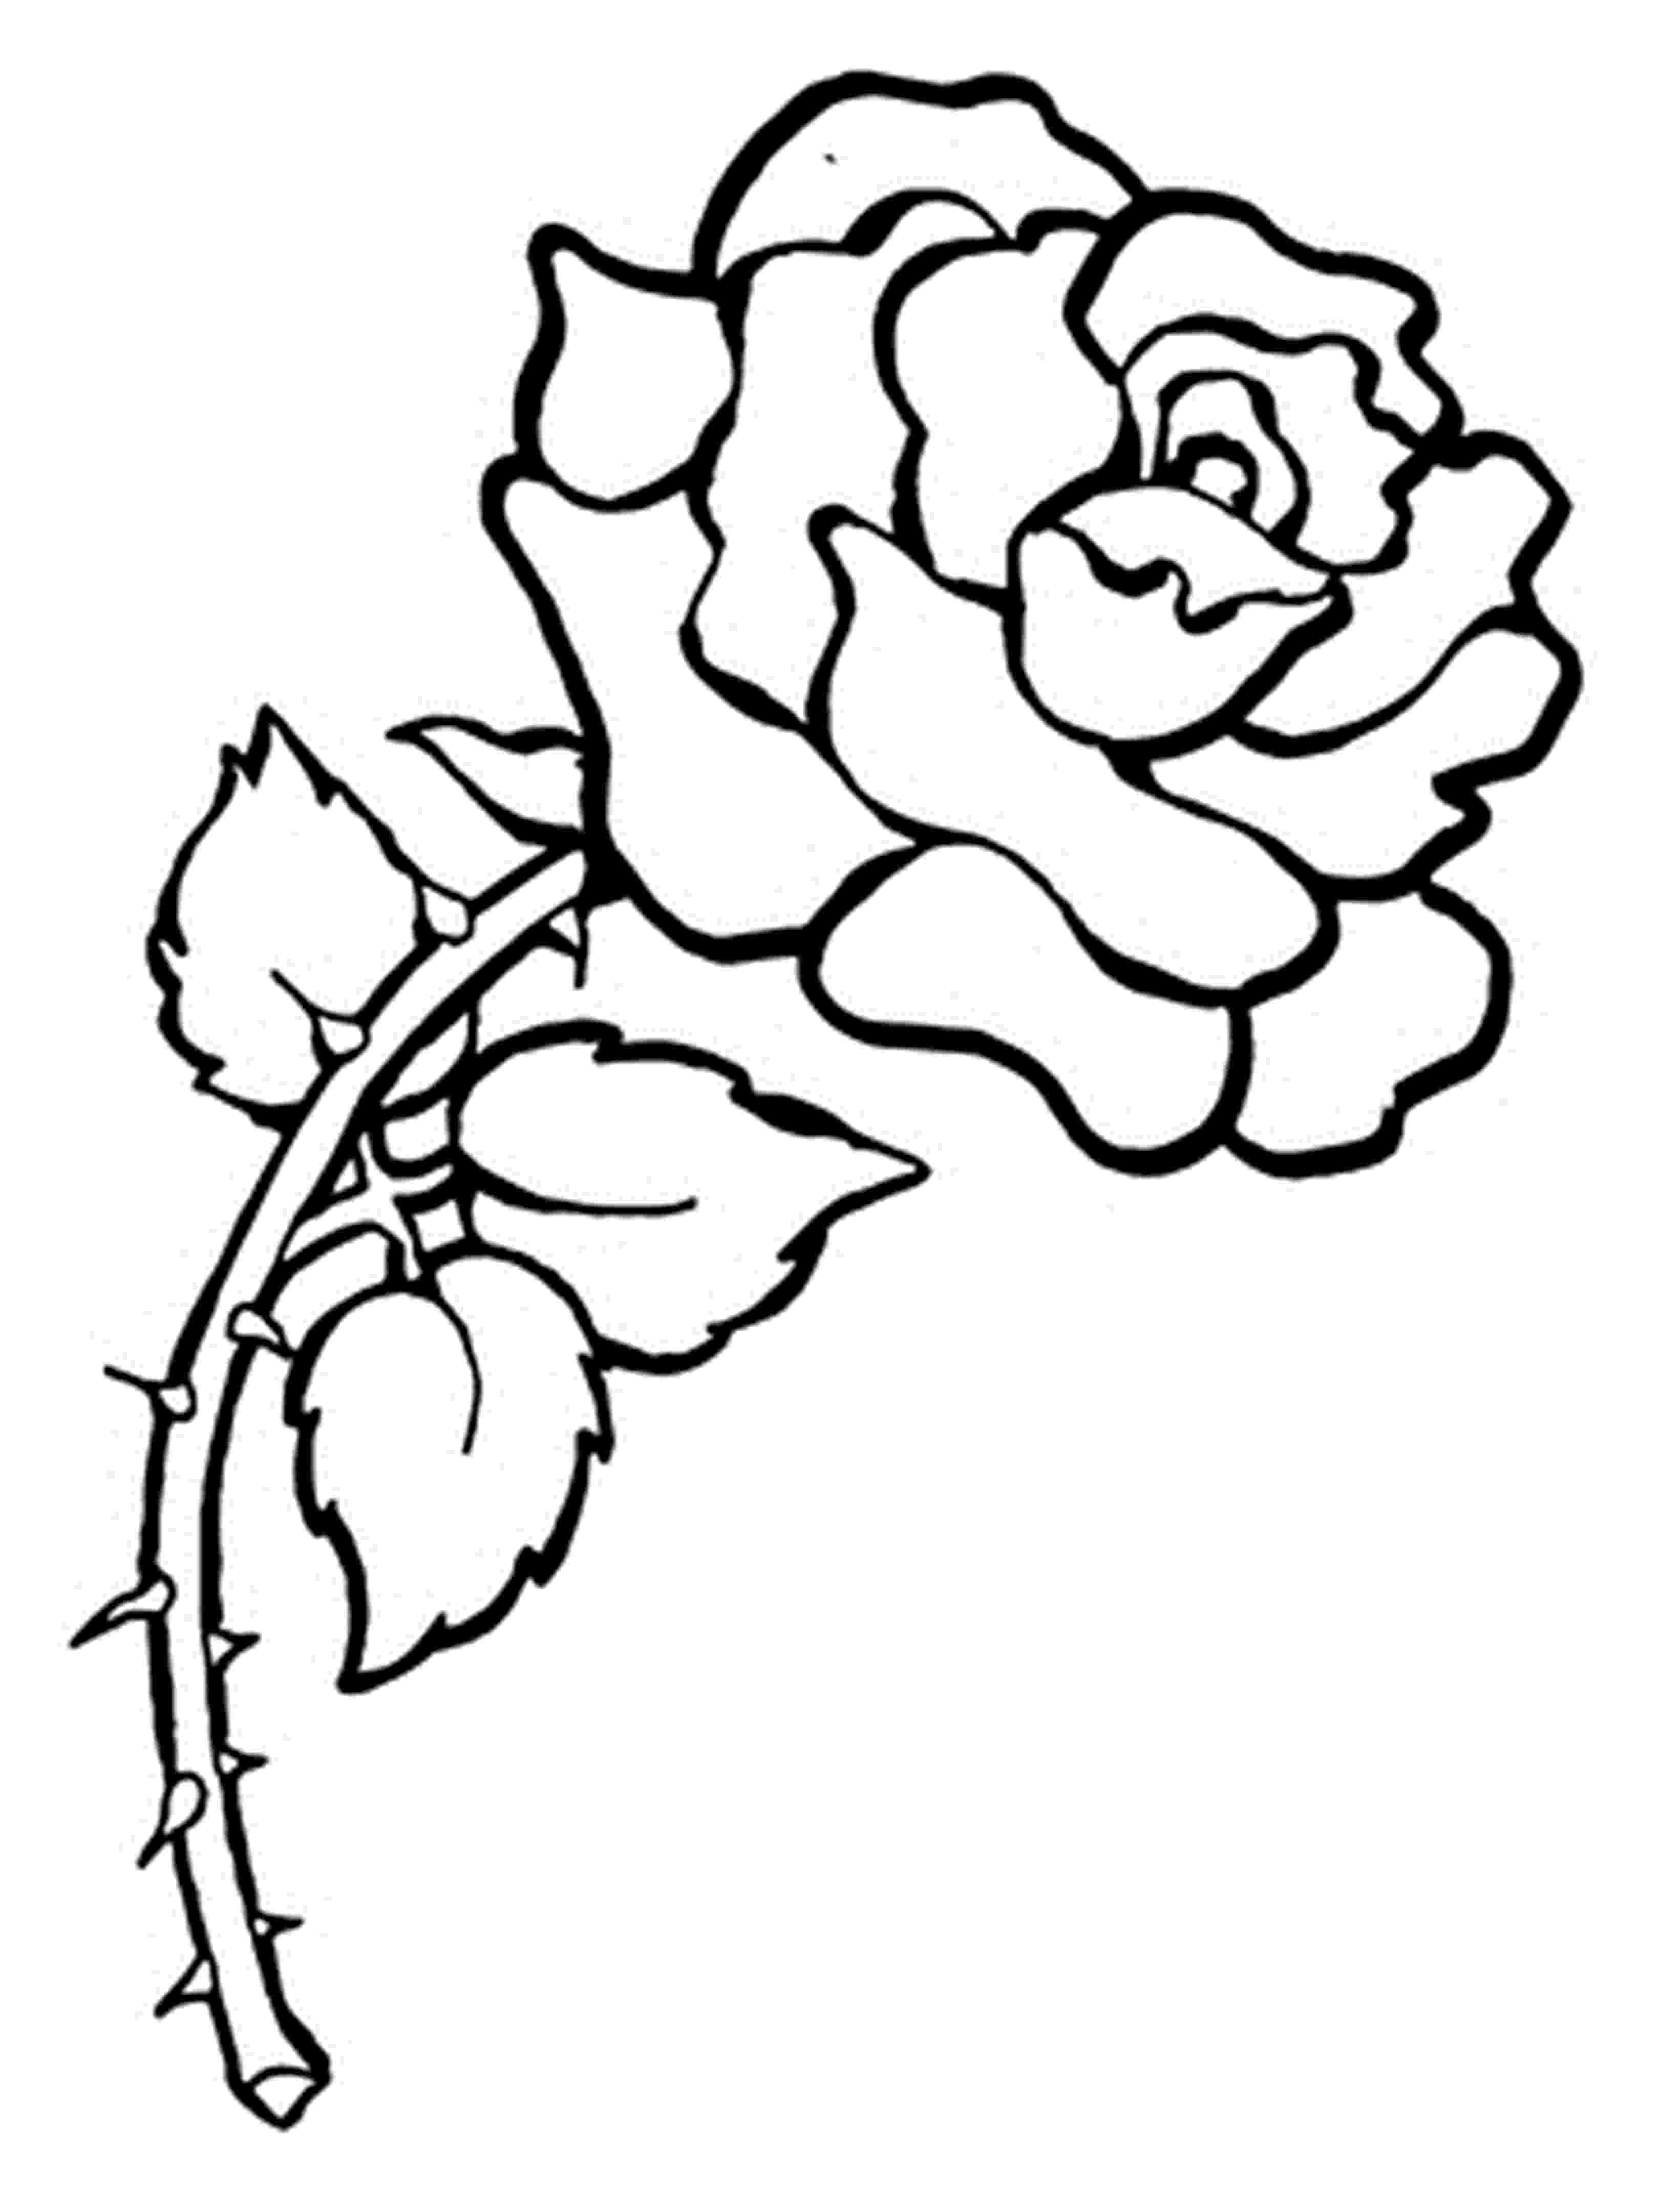 rose flower coloring pages flowers letmecolor flower coloring rose pages